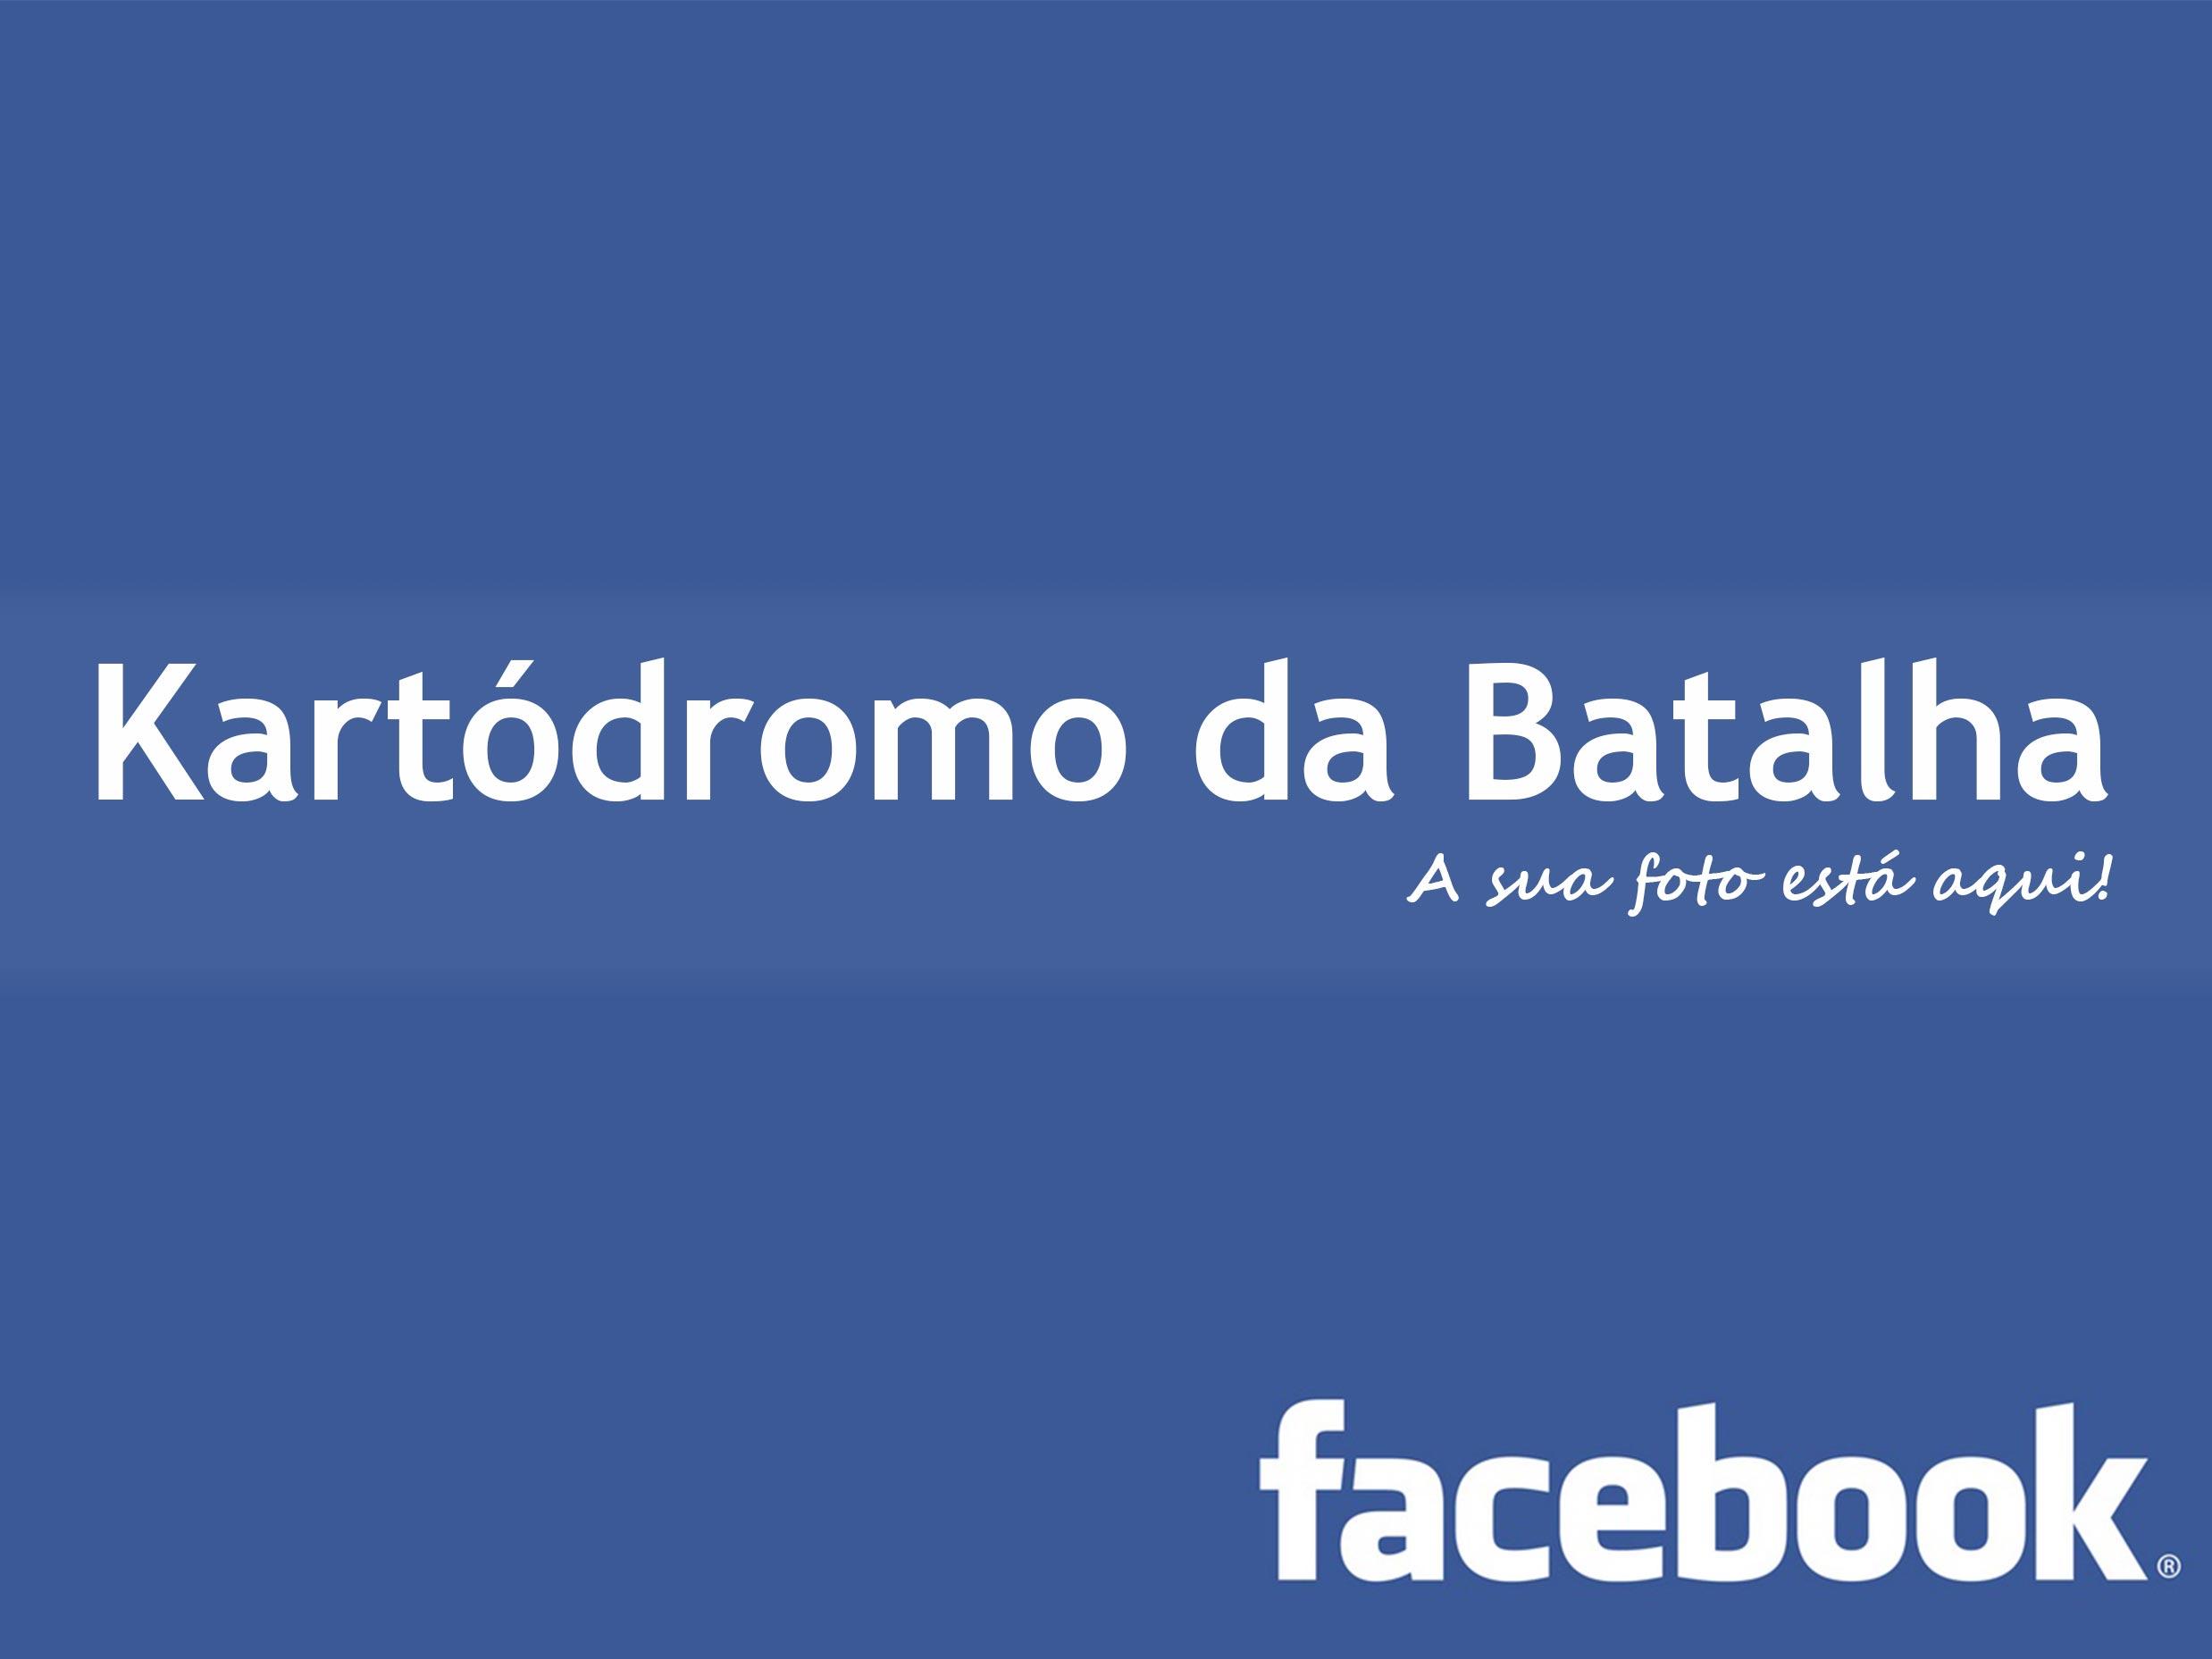 Euroindy Facebook do Kartodromo da Batalha